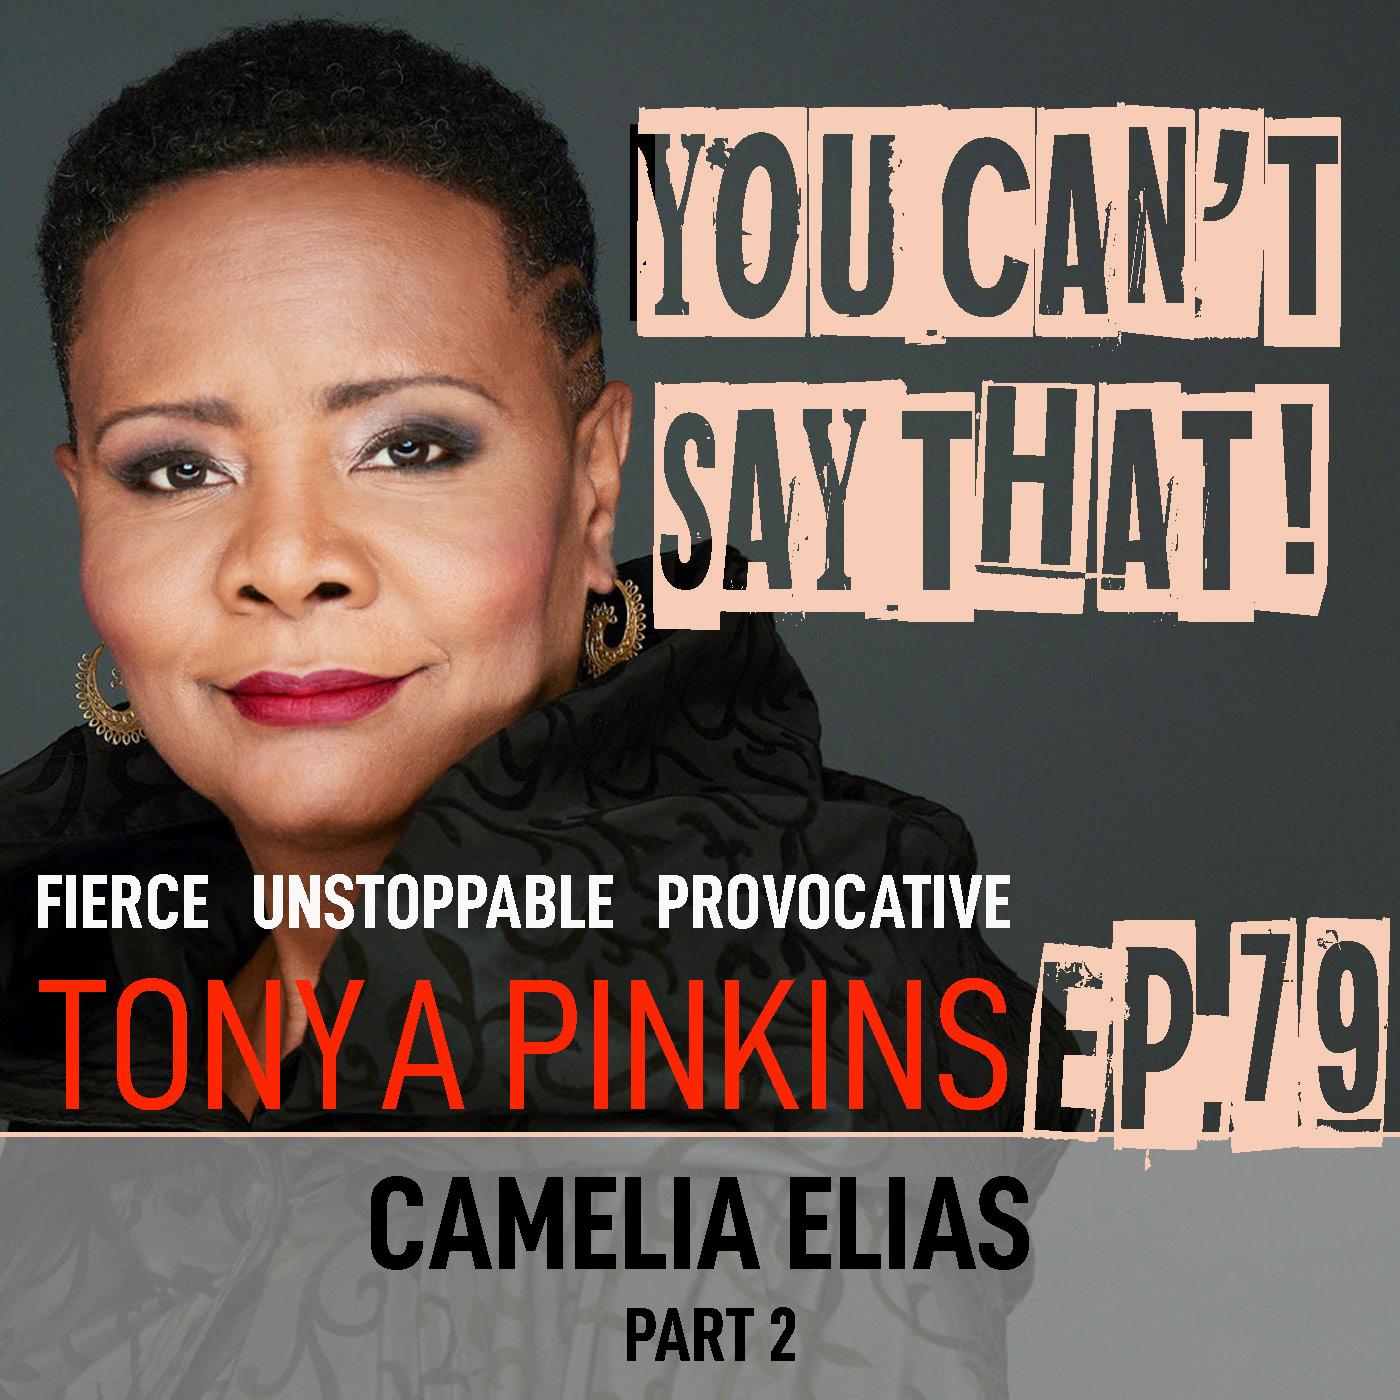 You Can't Say That Tonya Pinkins Ep79 - Camelia Elias (Part 2)